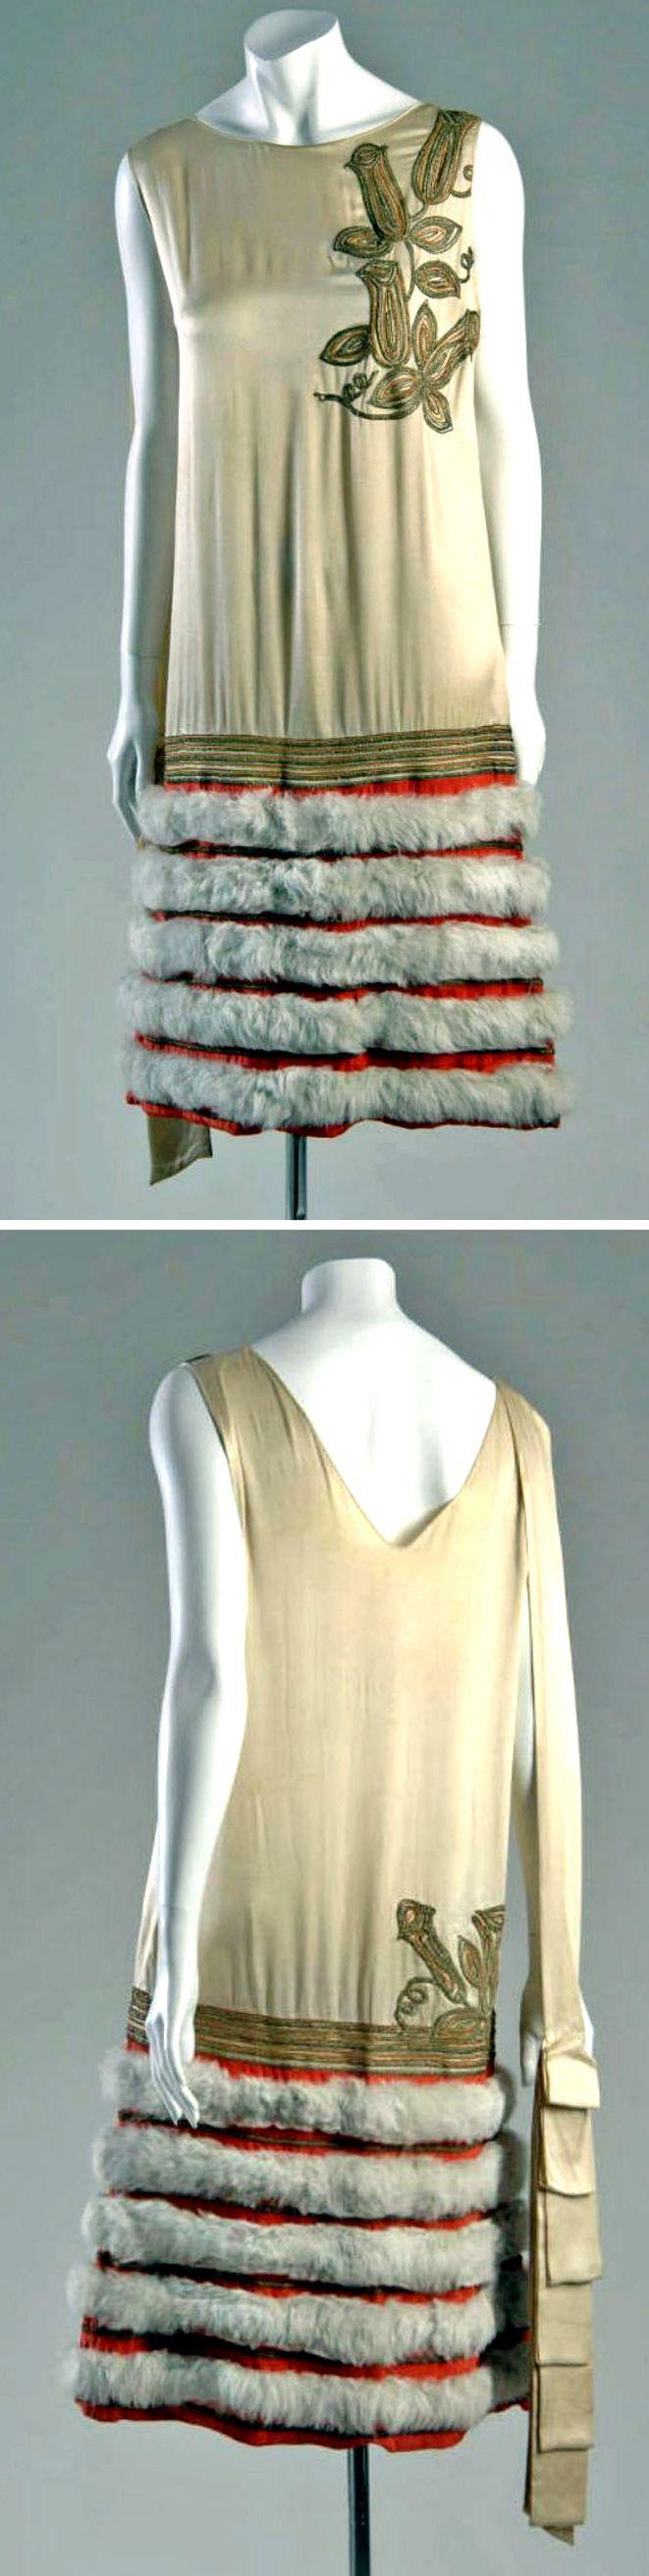 900 besten HISTORICAL DRESSES FOR 1920s PARTY Bilder auf Pinterest ...